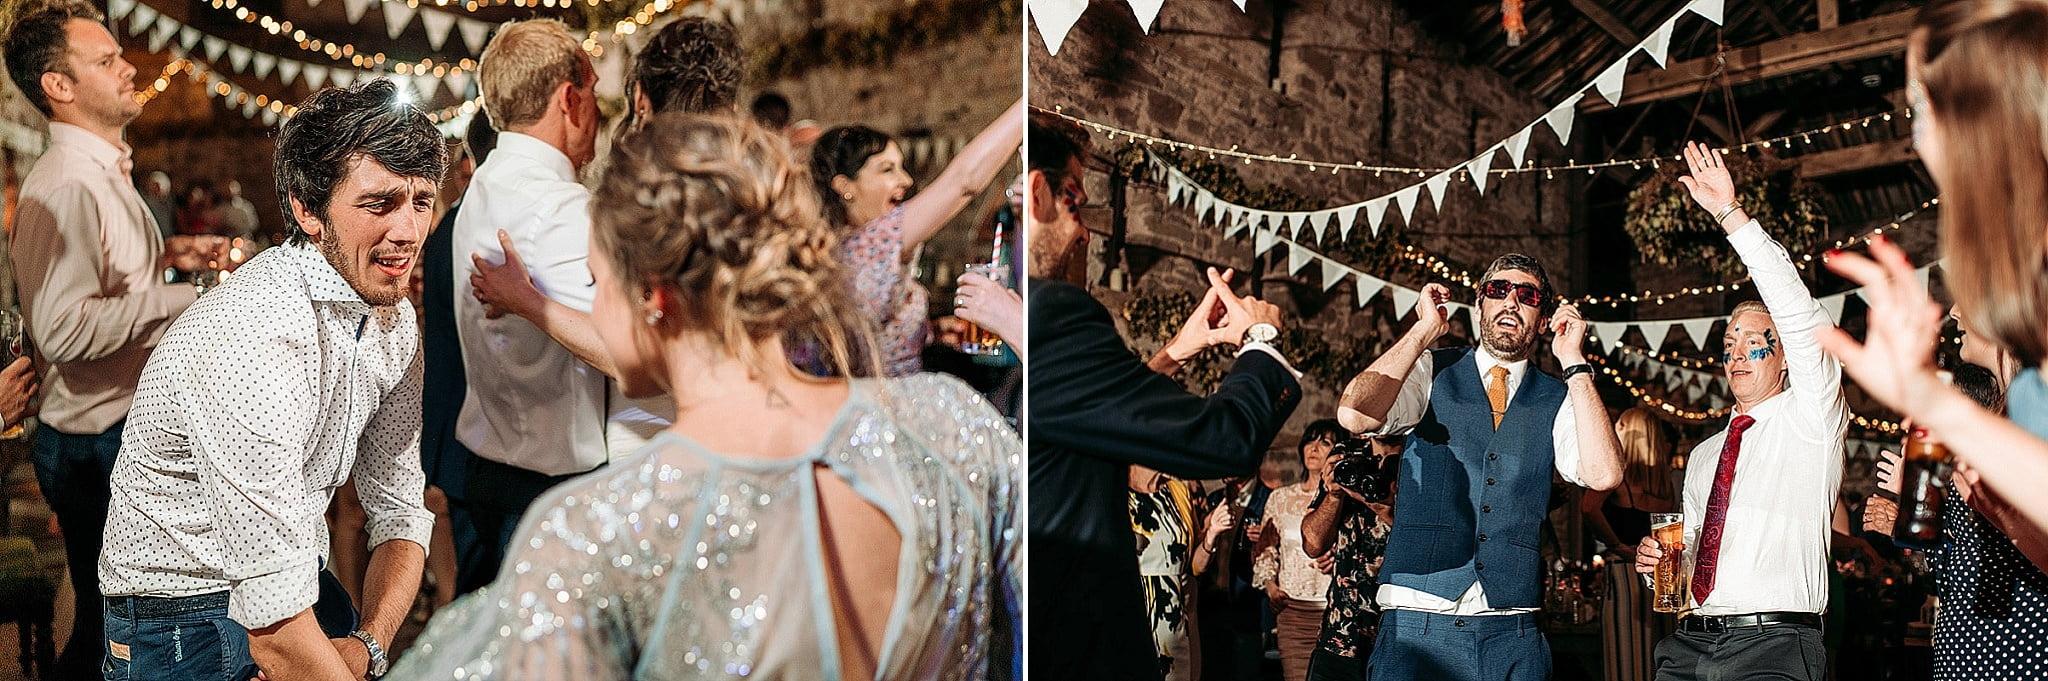 Lyde Court Wedding - Becky + Rhys 88